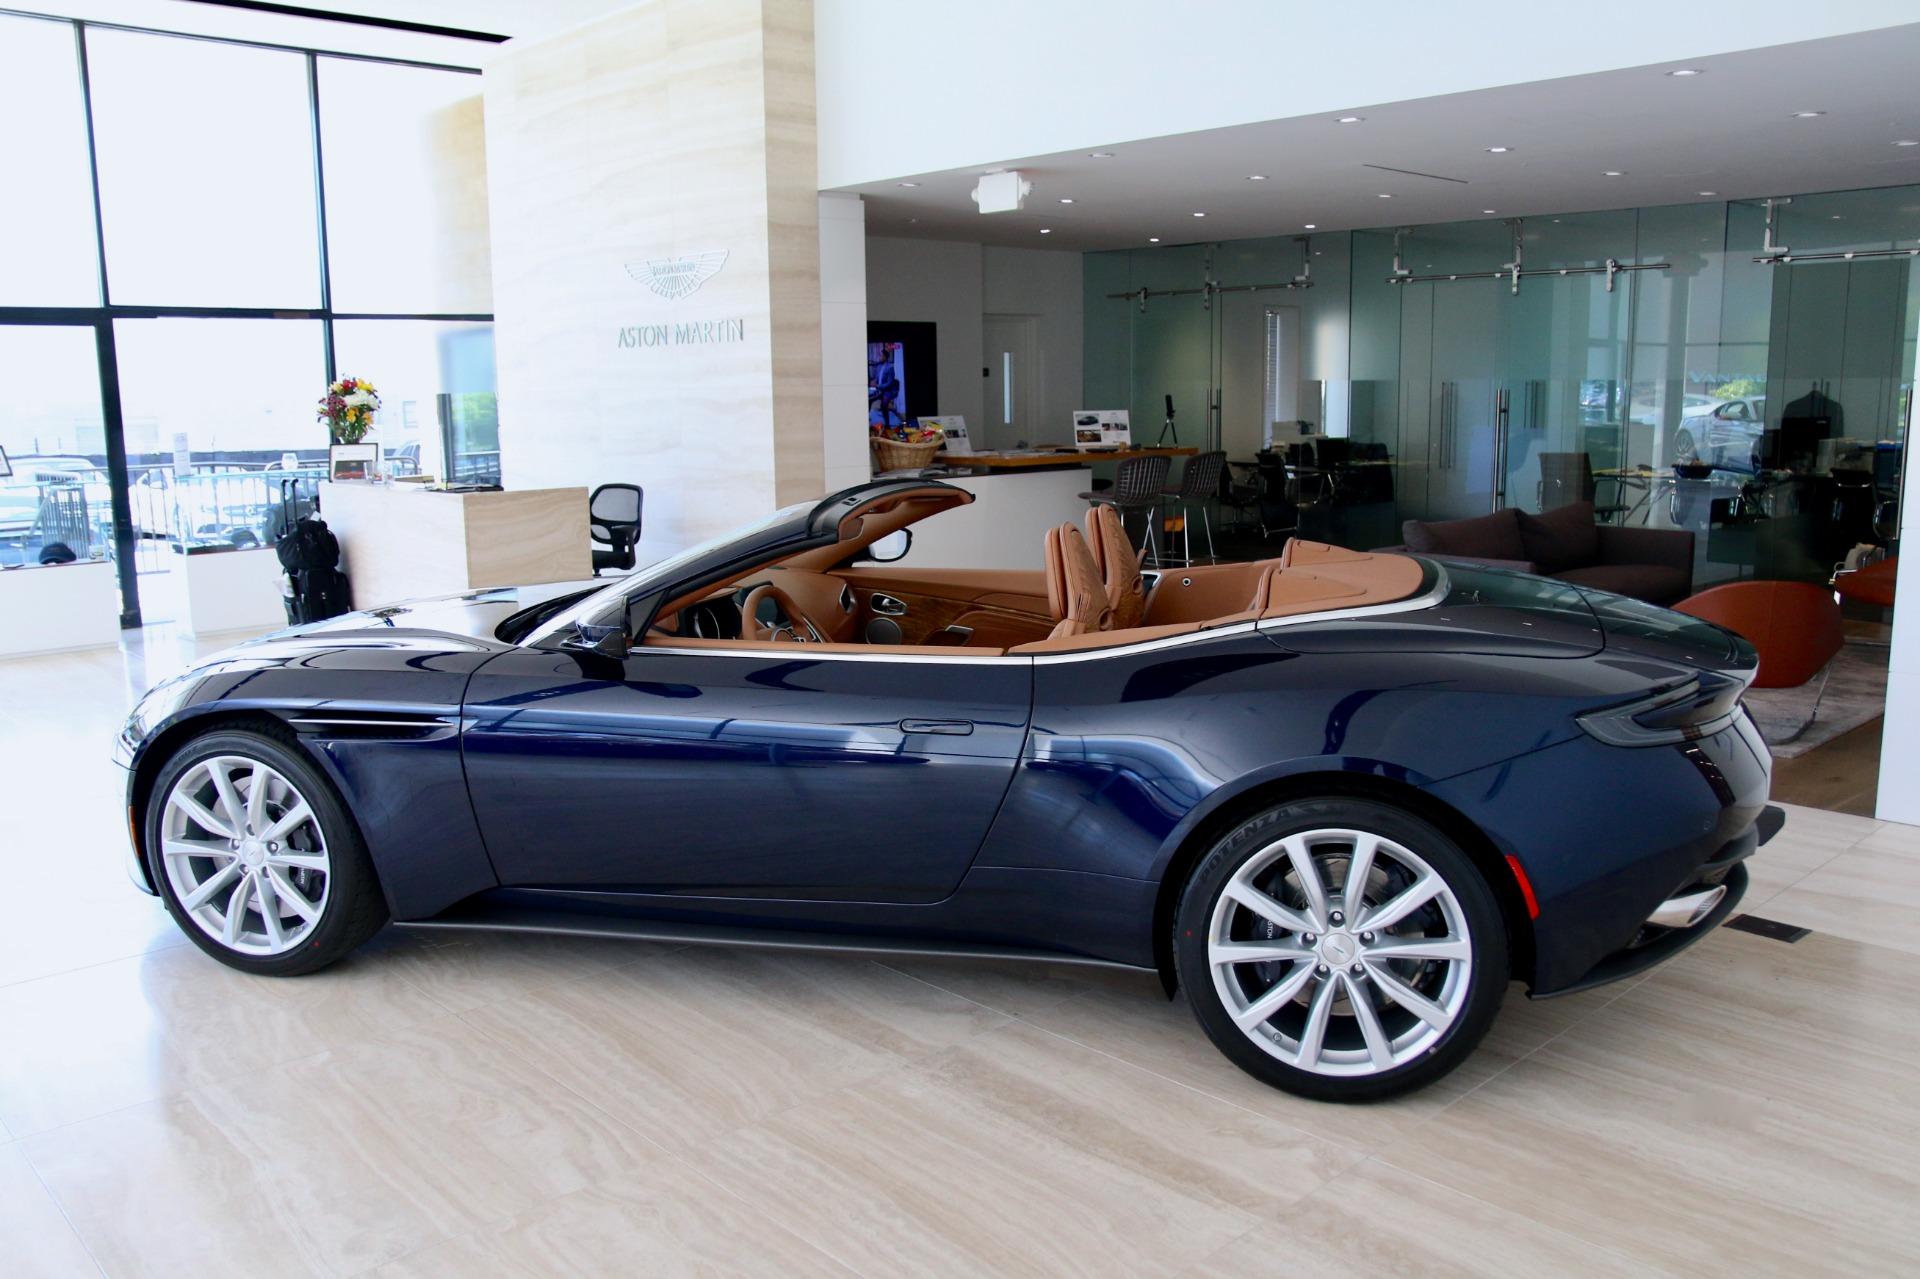 2019 Aston Martin Db11 Volante Stock 9nm06056 For Sale Near Vienna Va Va Aston Martin Dealer